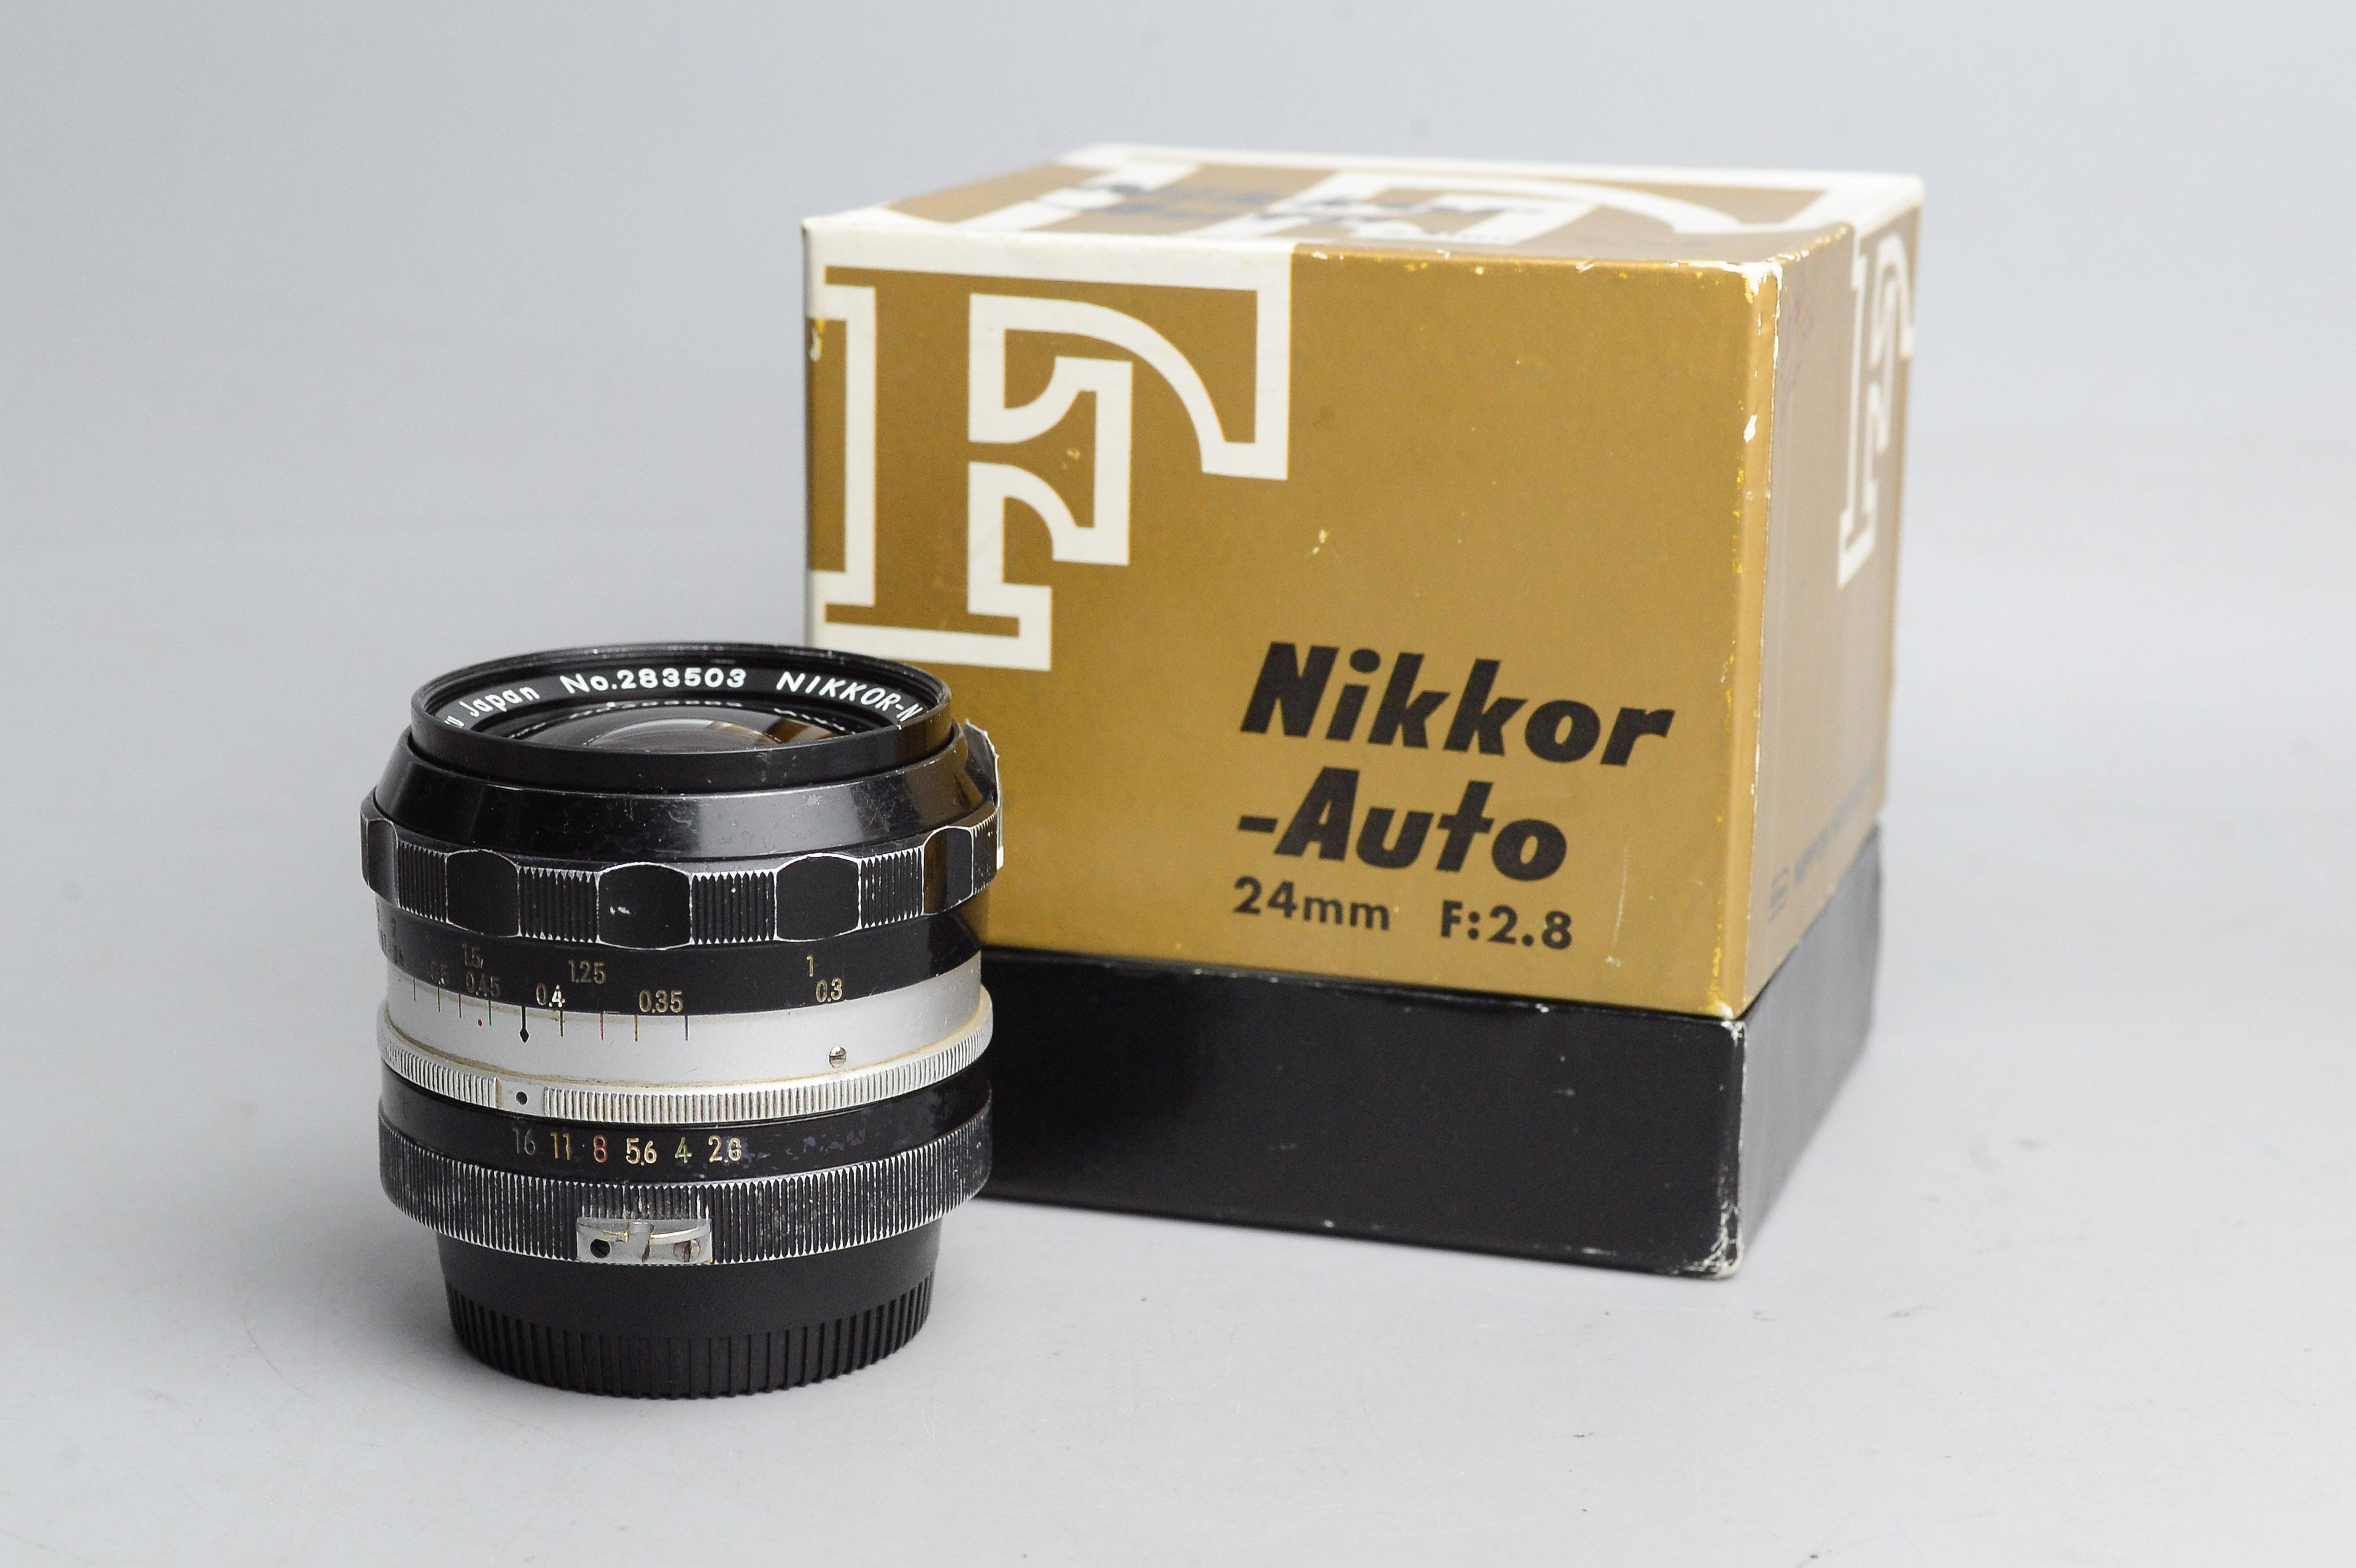 nikon-24mm-f2-8-non-ai-mf-24-2-8-fullbox-18010